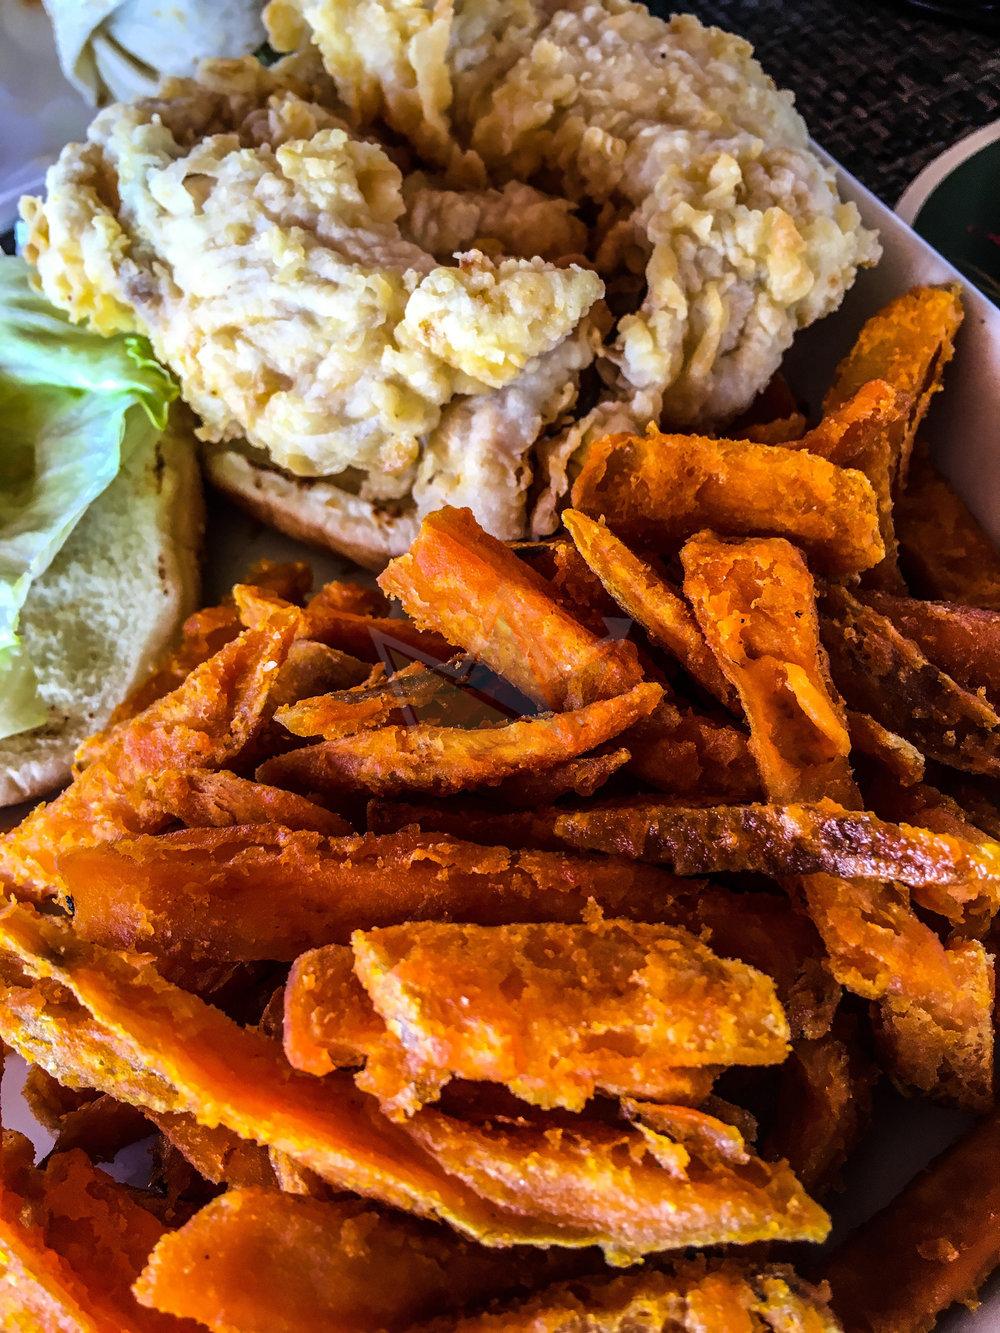 Fish Burger w/ Sweet Potato Fries